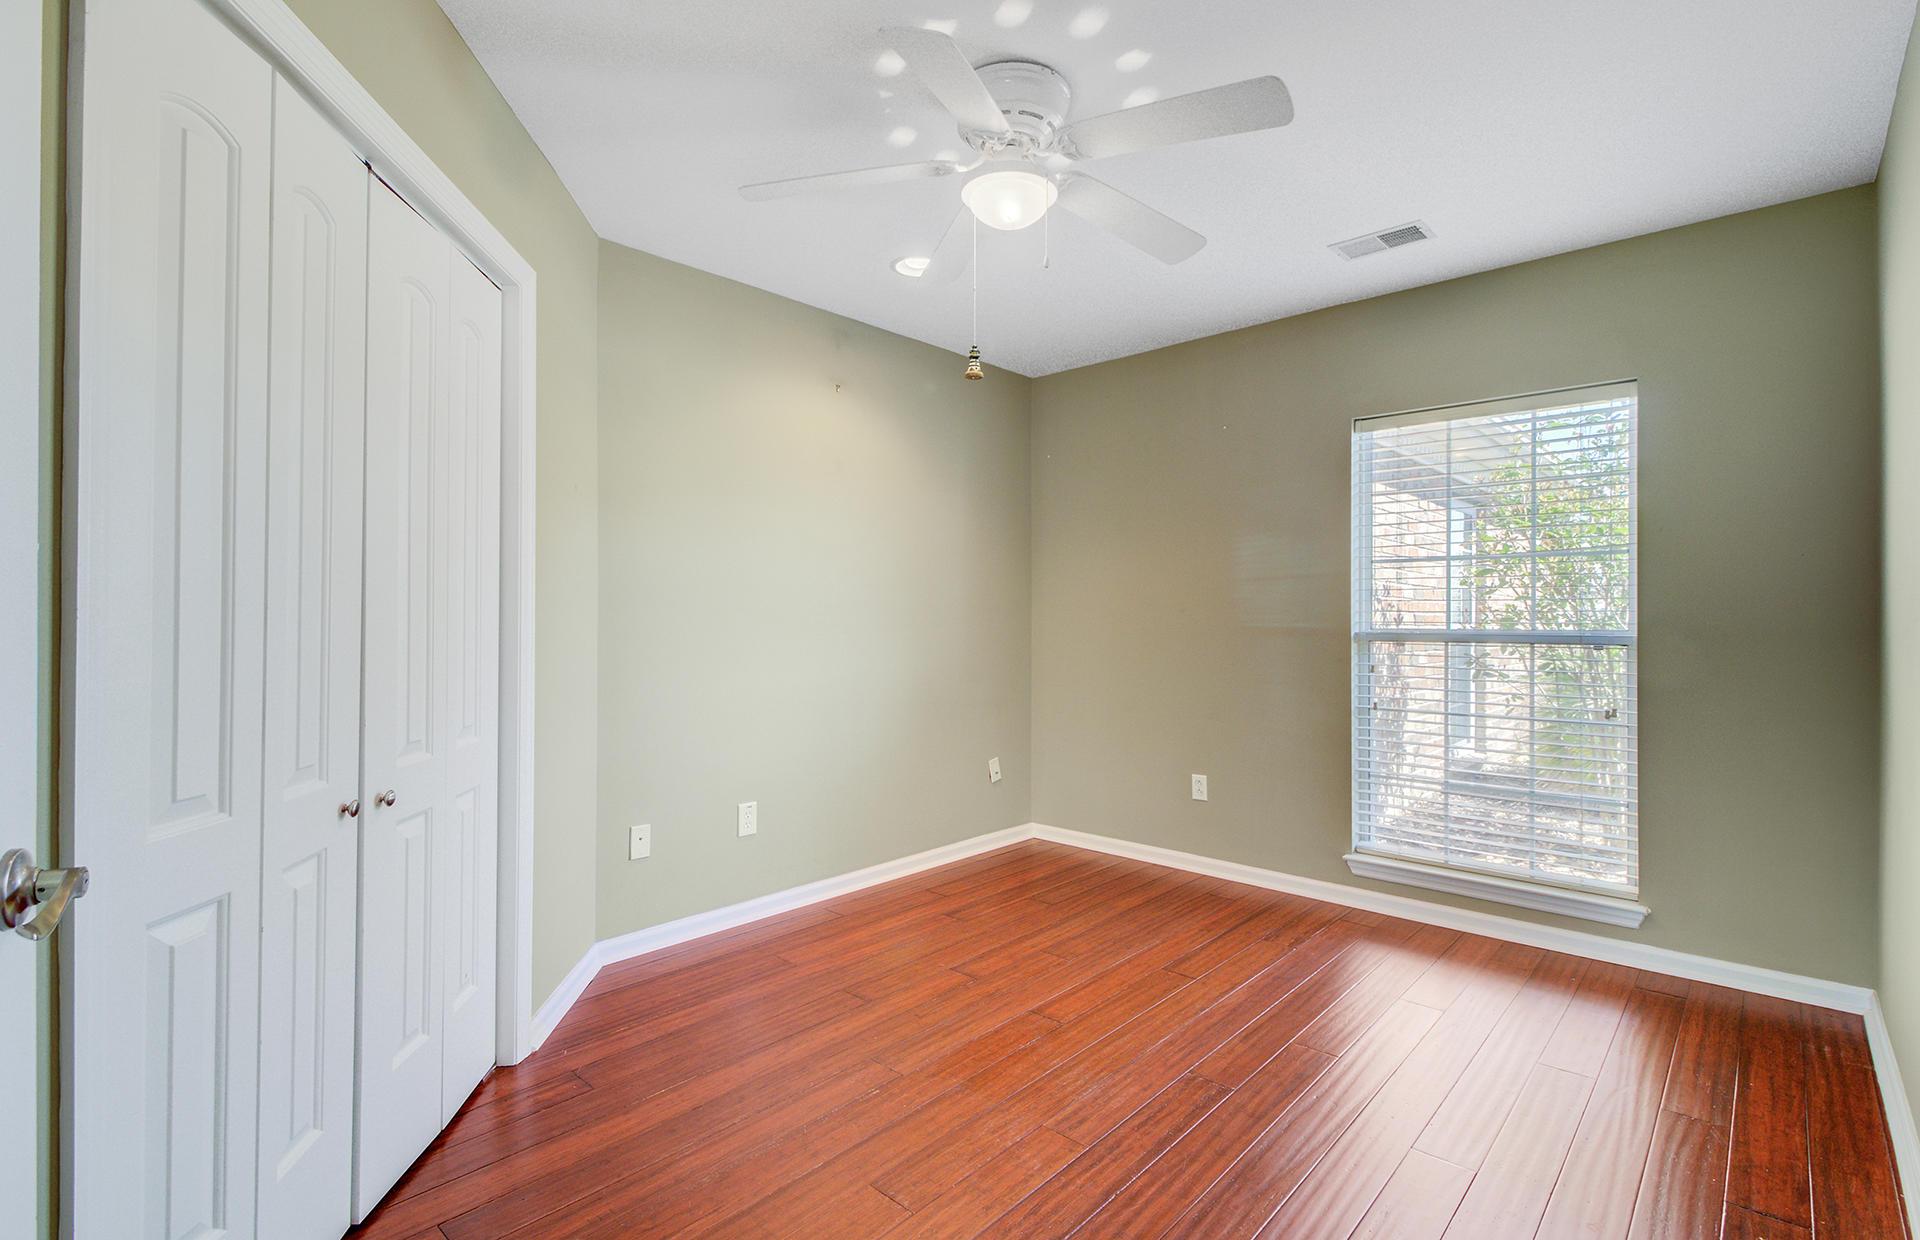 Grand Oaks Plantation Homes For Sale - 789 Bent Hickory, Charleston, SC - 14